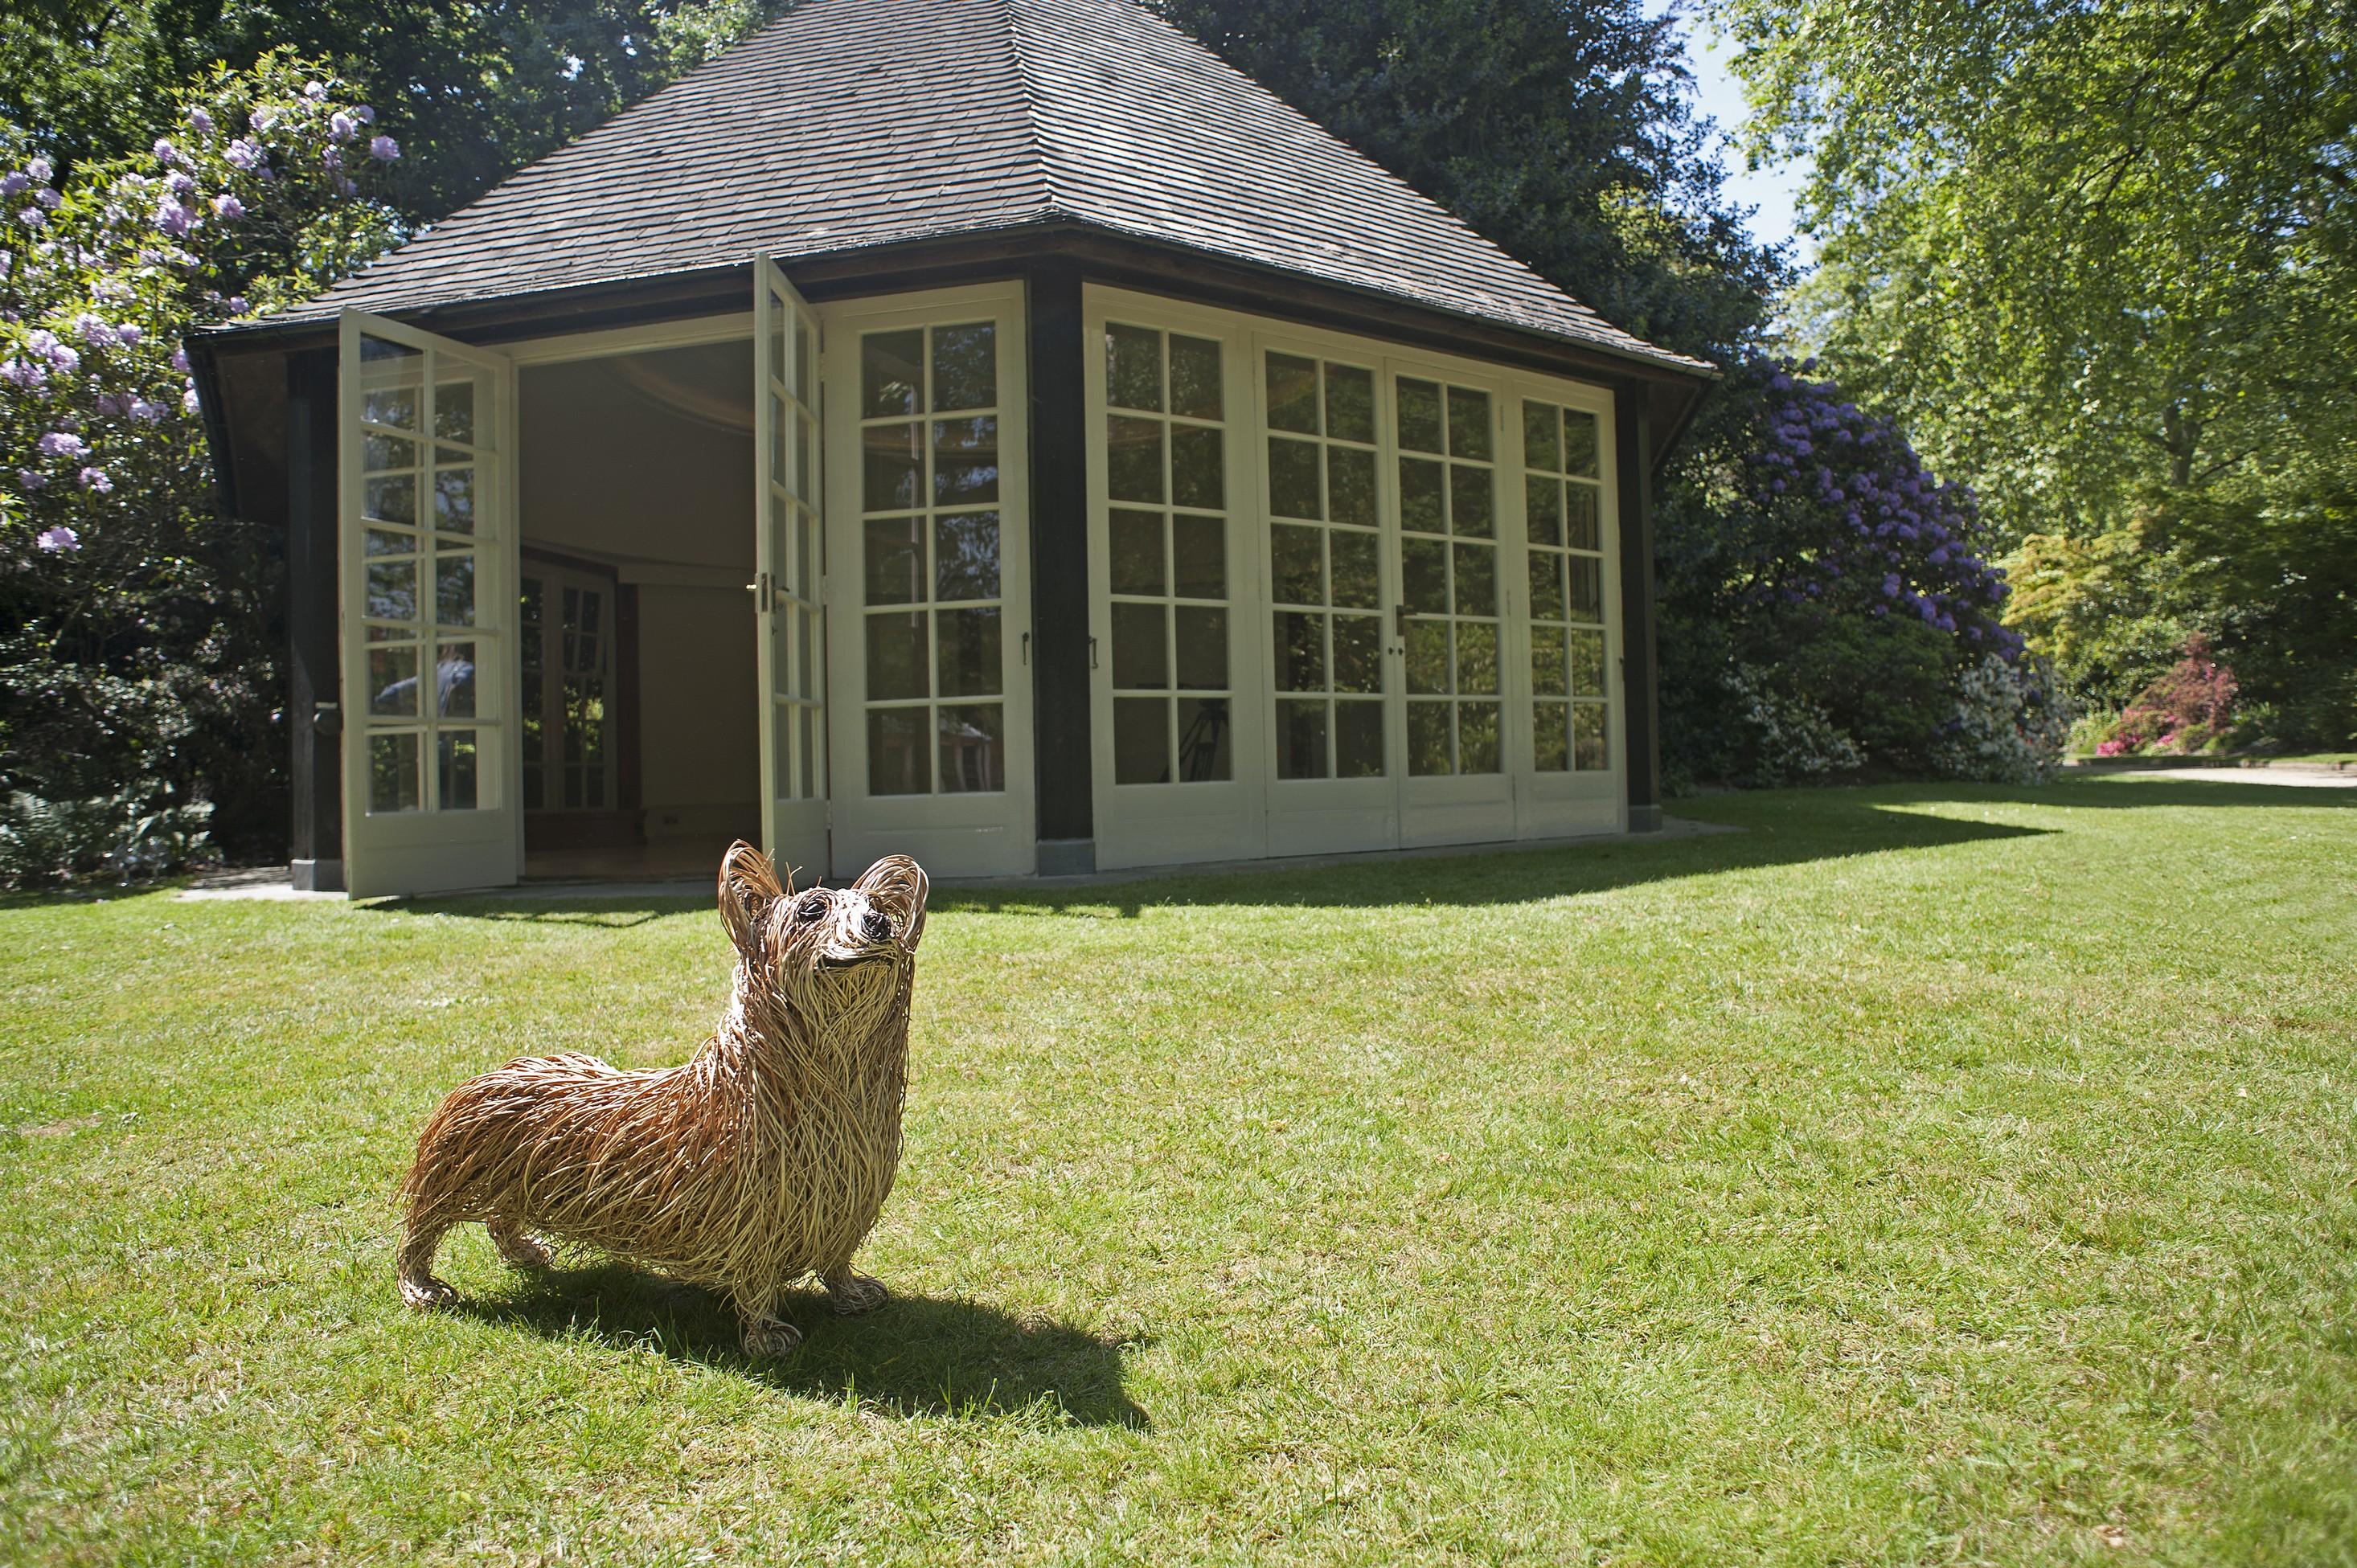 Bob's corgi has pride of place at Coronation Festival